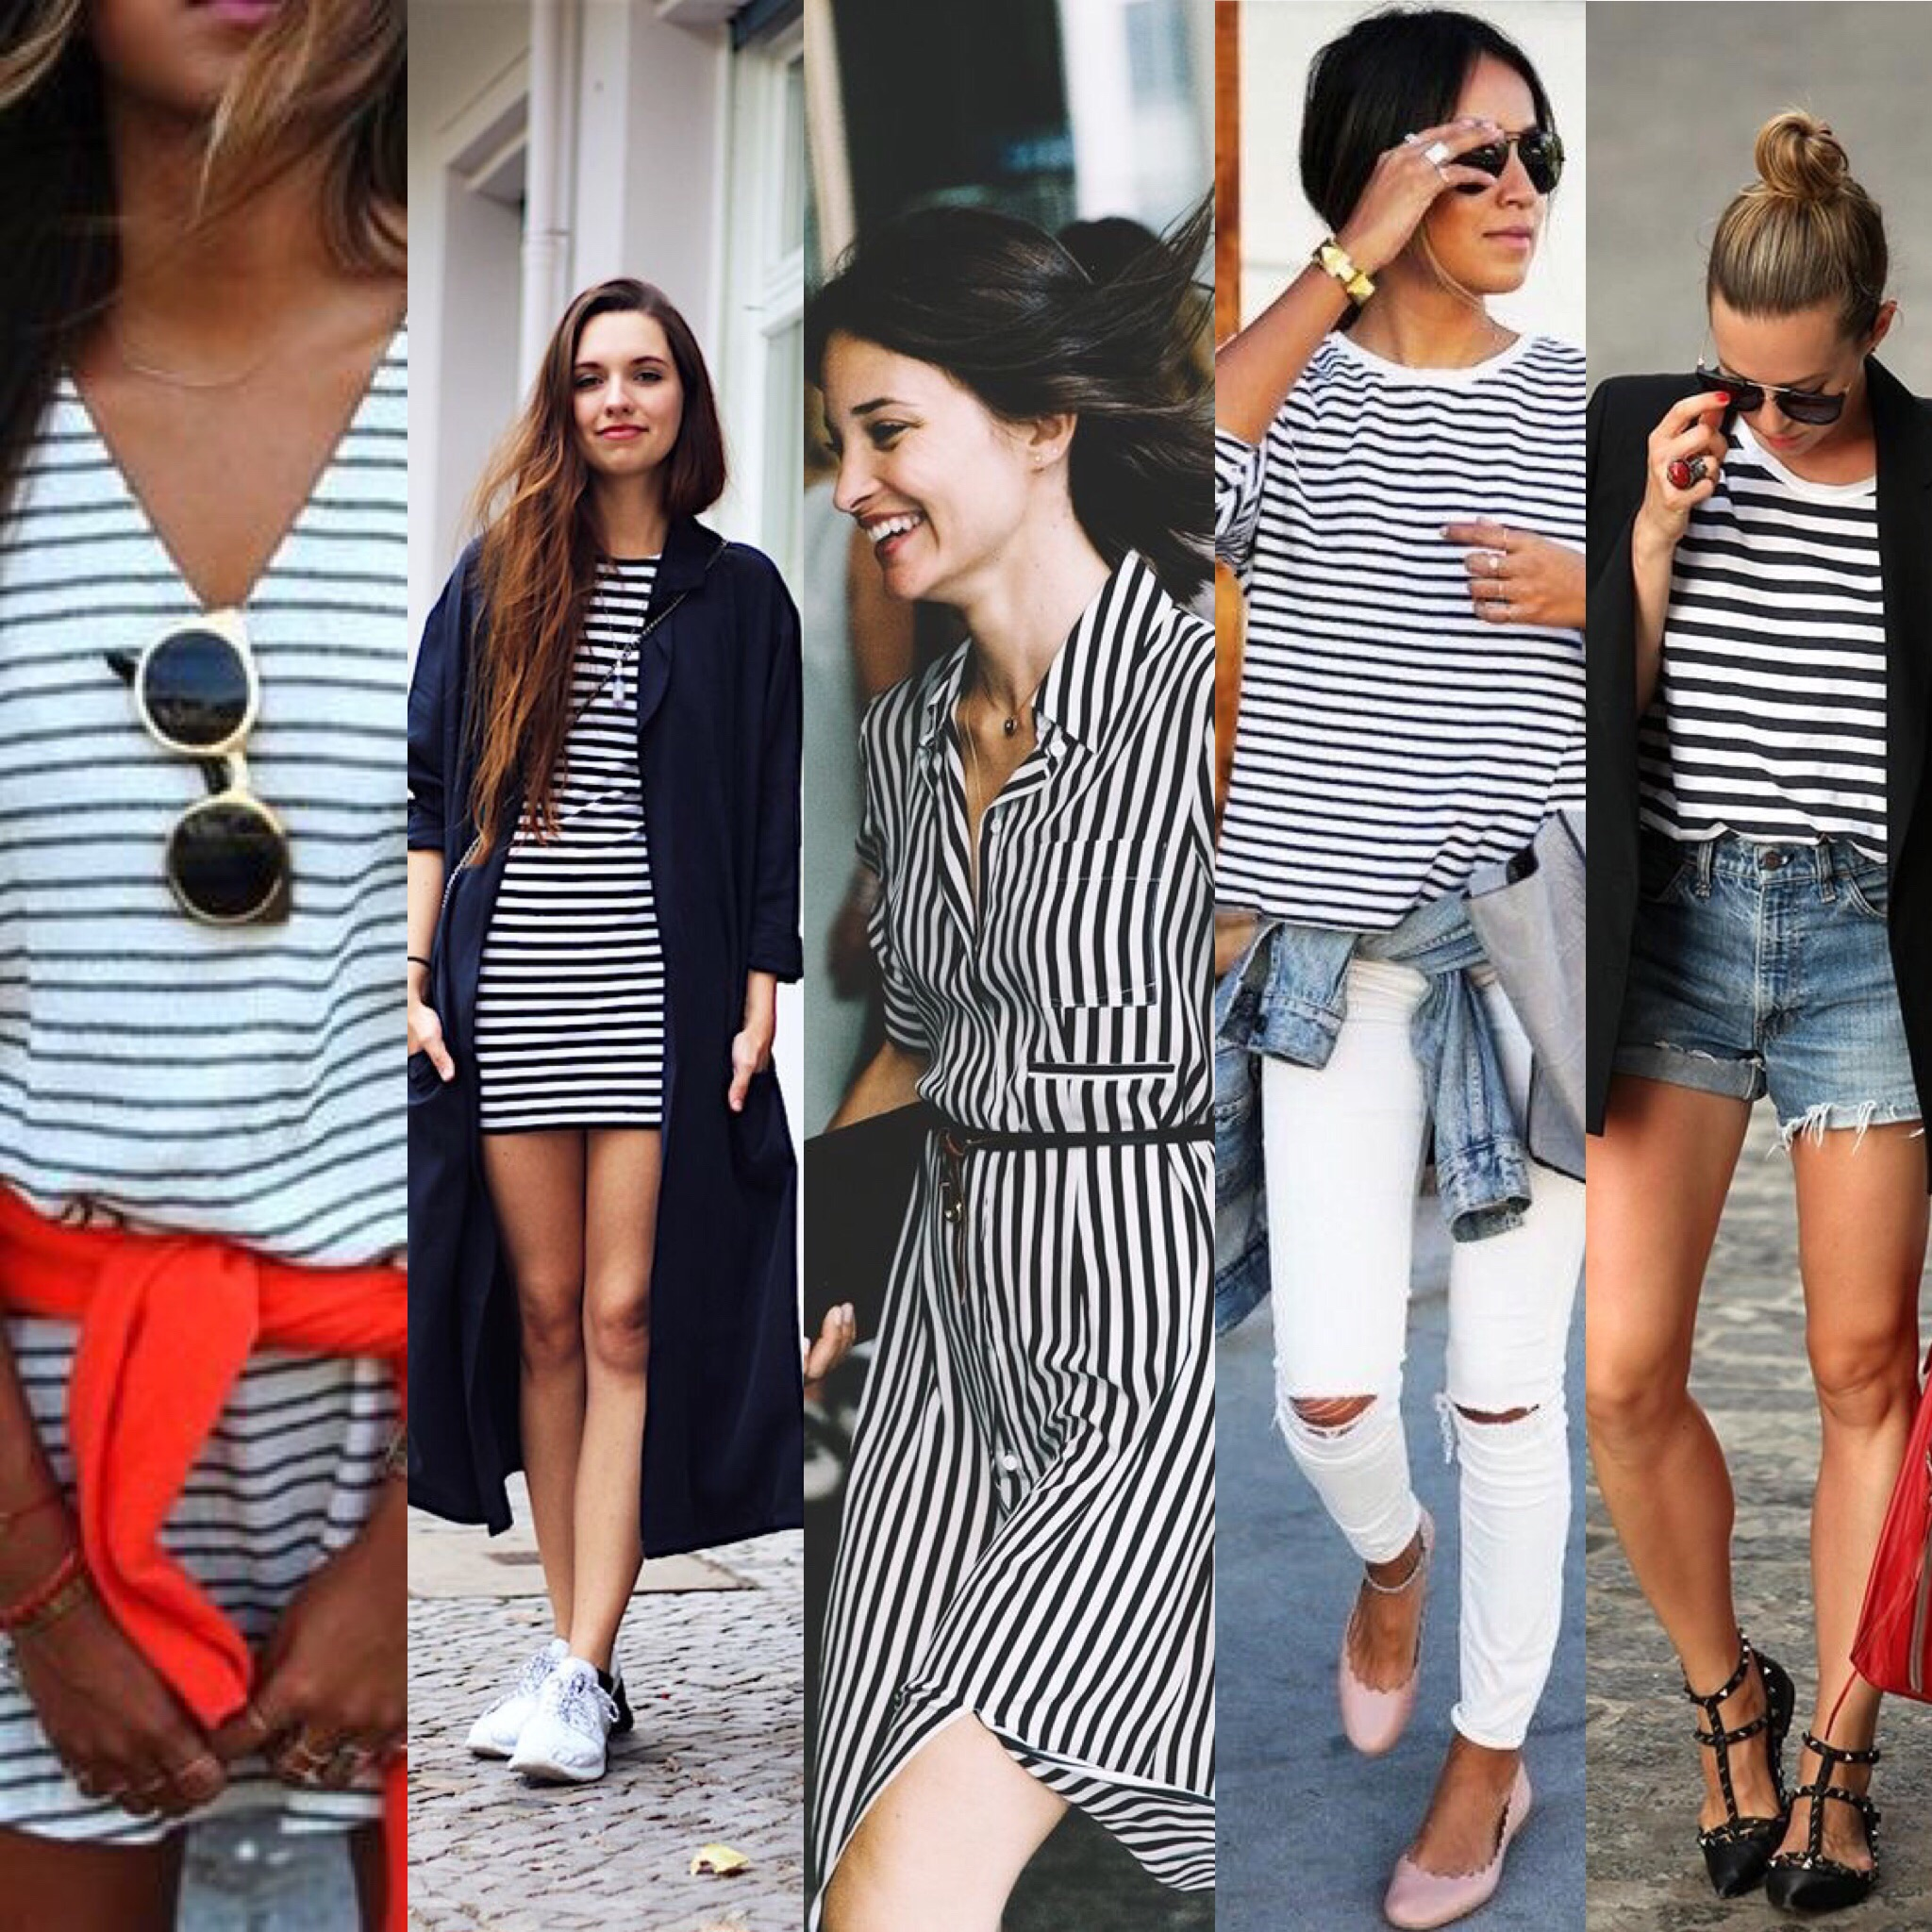 L-R  Striped Dress , Gold Sunnies.  Striped Dress,  Long Sweater.  Vertically Striped Dress .  Striped Shirt , White Denim.  Striped Shirt , Jean Shorts.